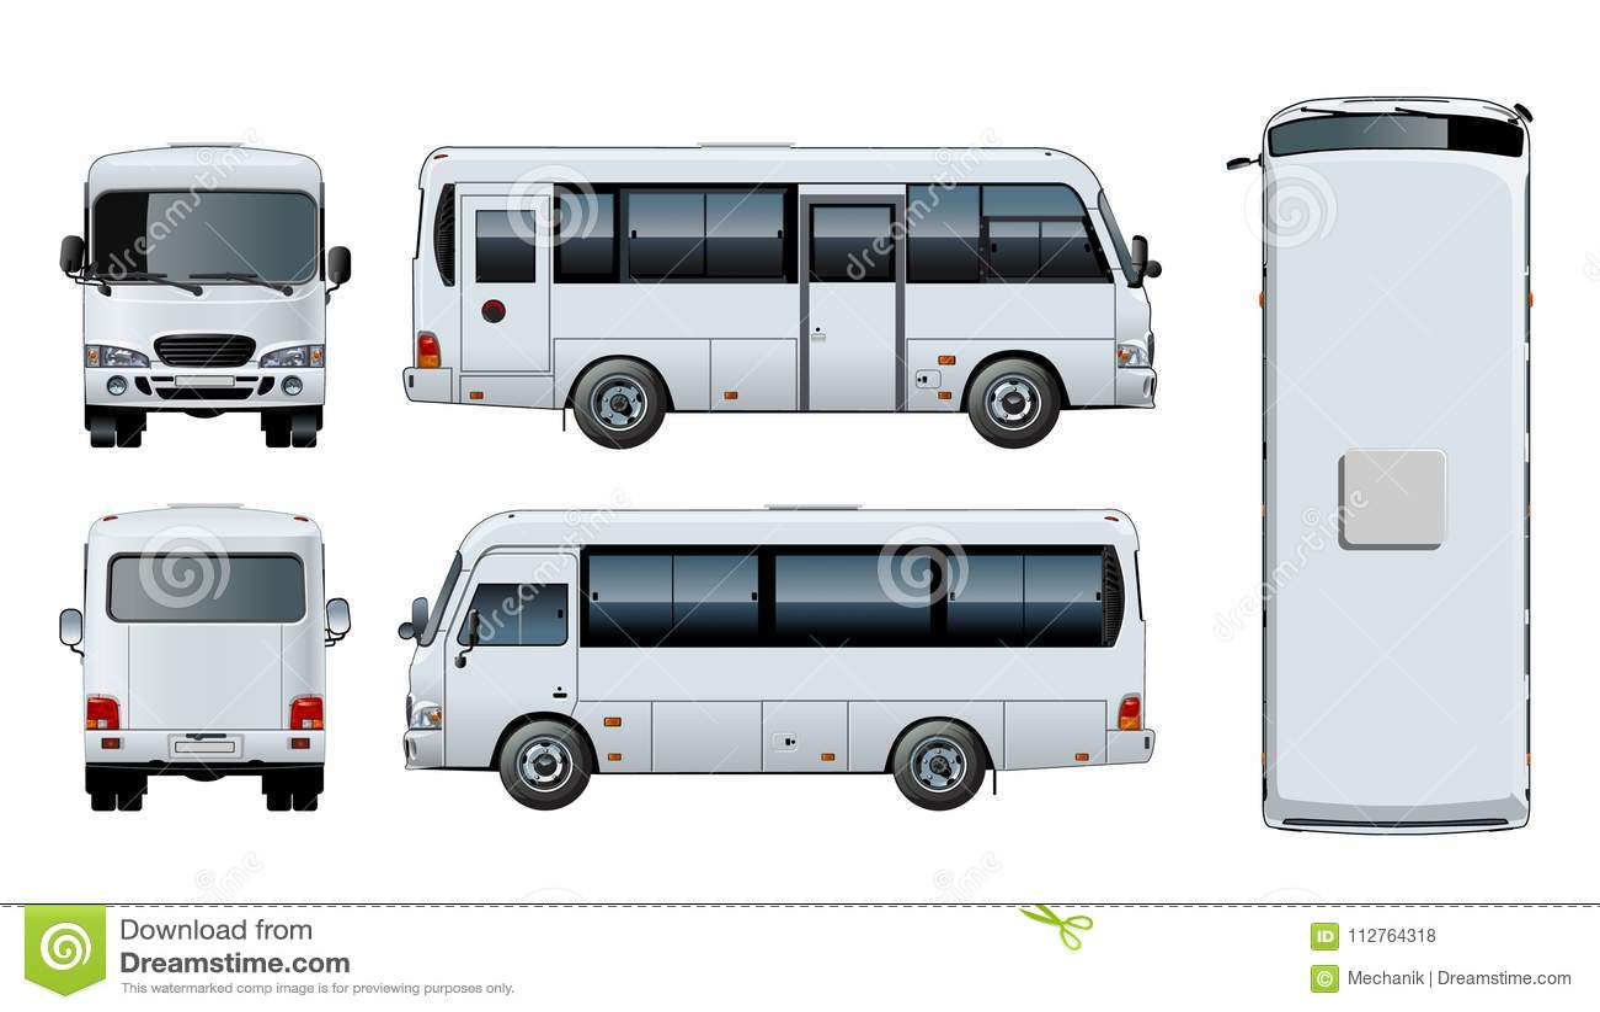 bccea3e49ac3 Vector Urban Passenger Mini-bus Mock-up Stock Vector - Illustration ...